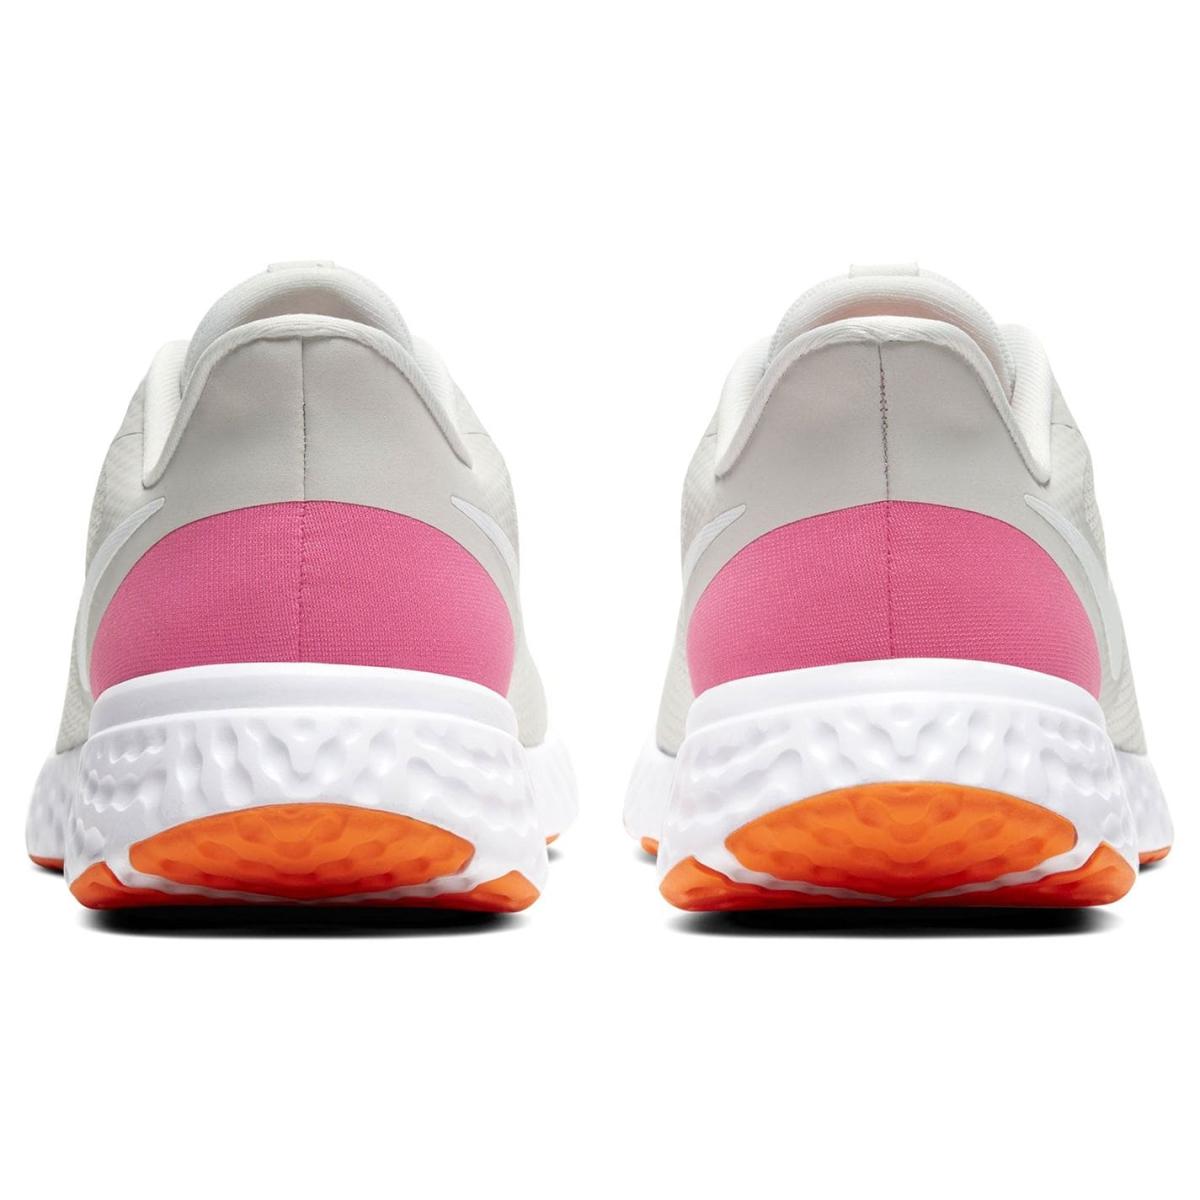 Nike-Revolution-Turnschuhe-Damen-Sneaker-Sportschuhe-Laufschuhe-1160 Indexbild 33